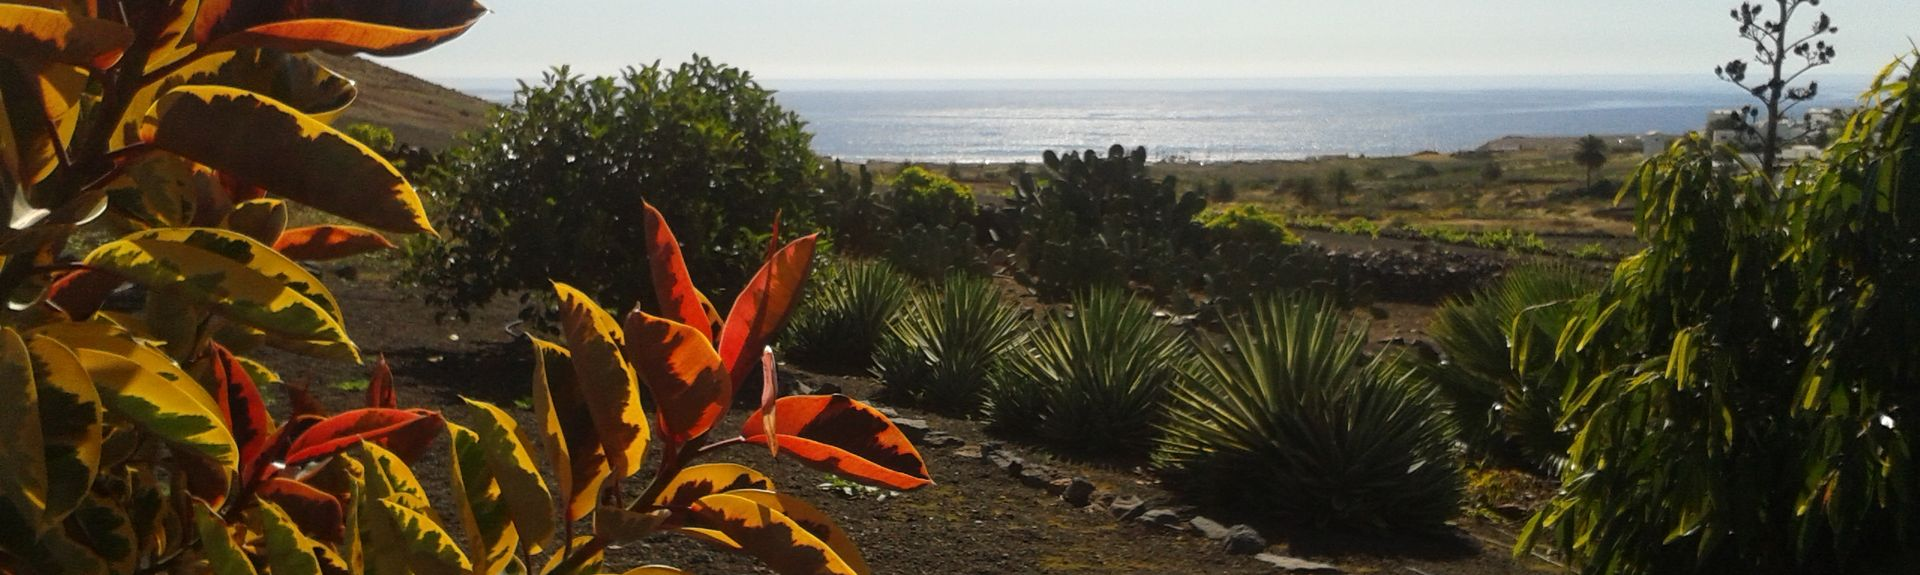 Lanzarote, Kanarieöarna, Spanien